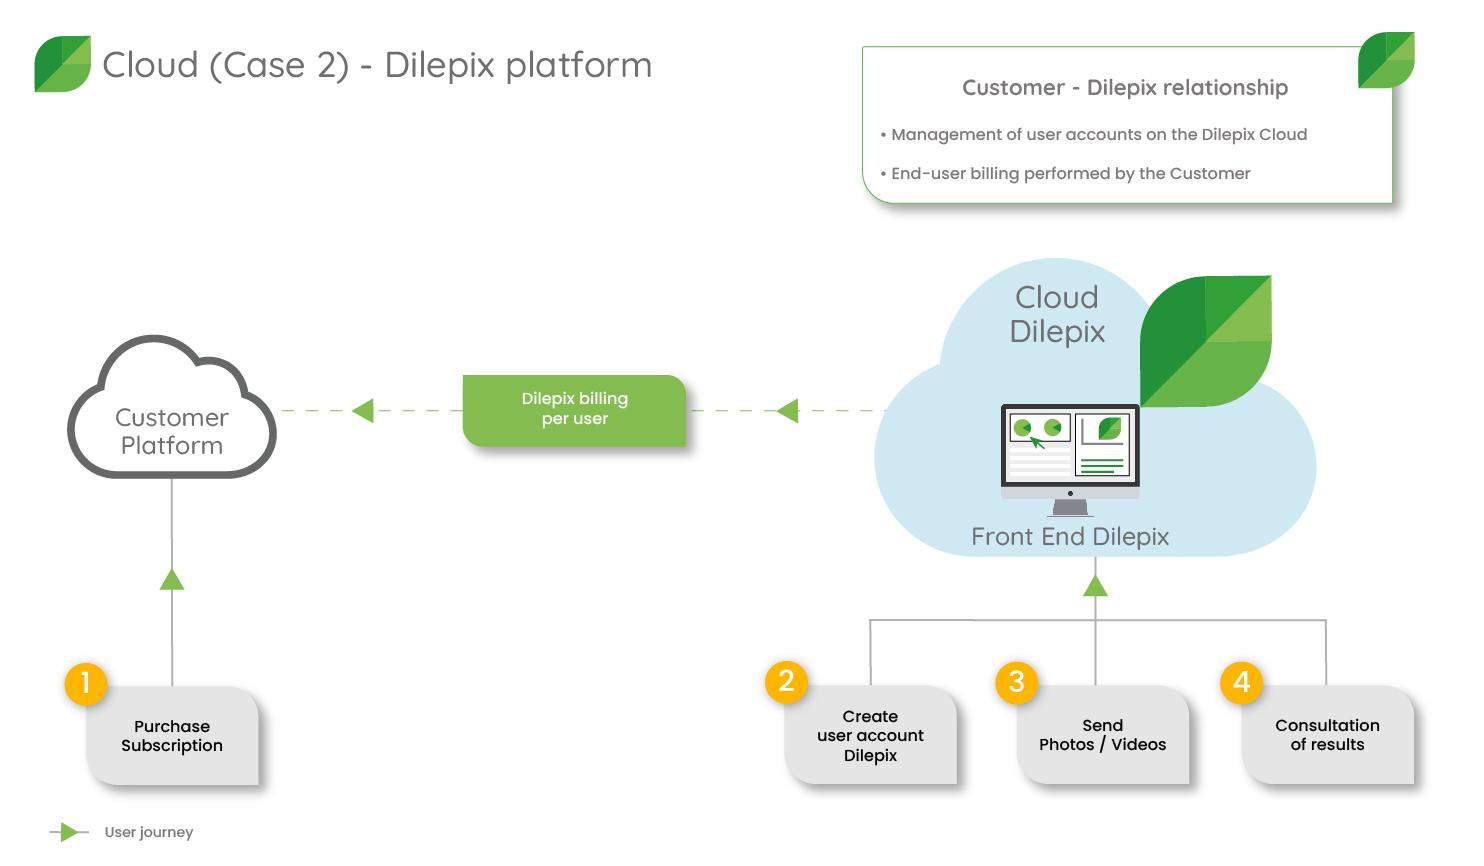 Dilepix Cloud scenario 2 solution from the Dilepix platform